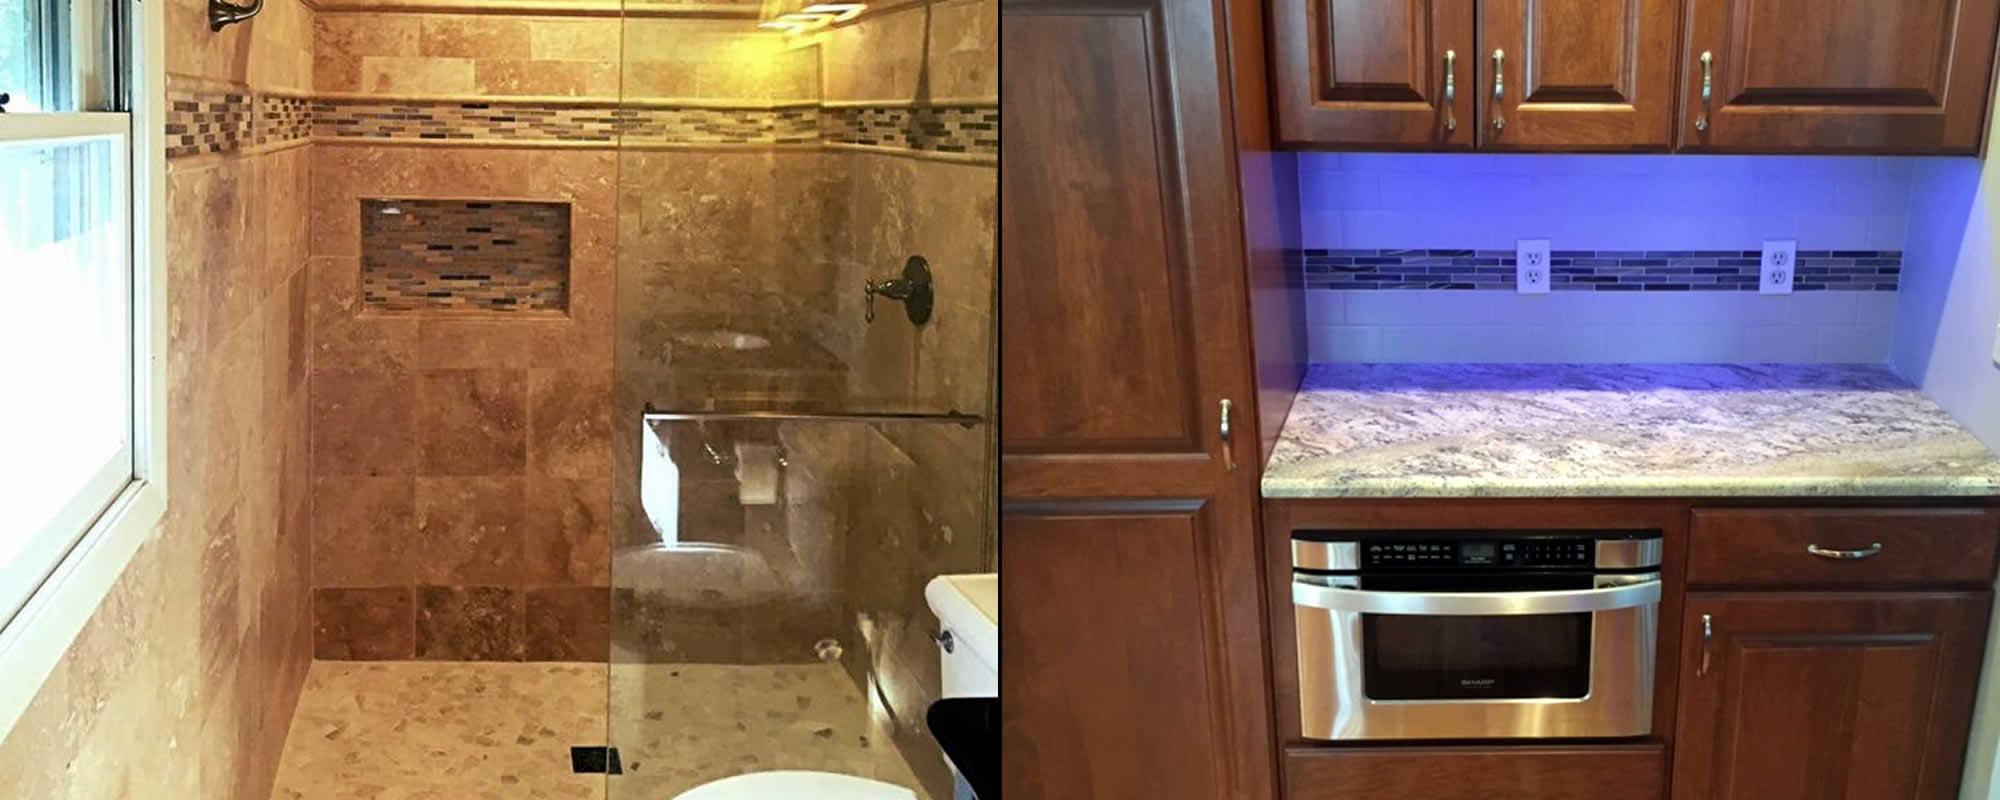 Ward Kitchen U0026 Bath Design   Construction/Remodeling   WI ...